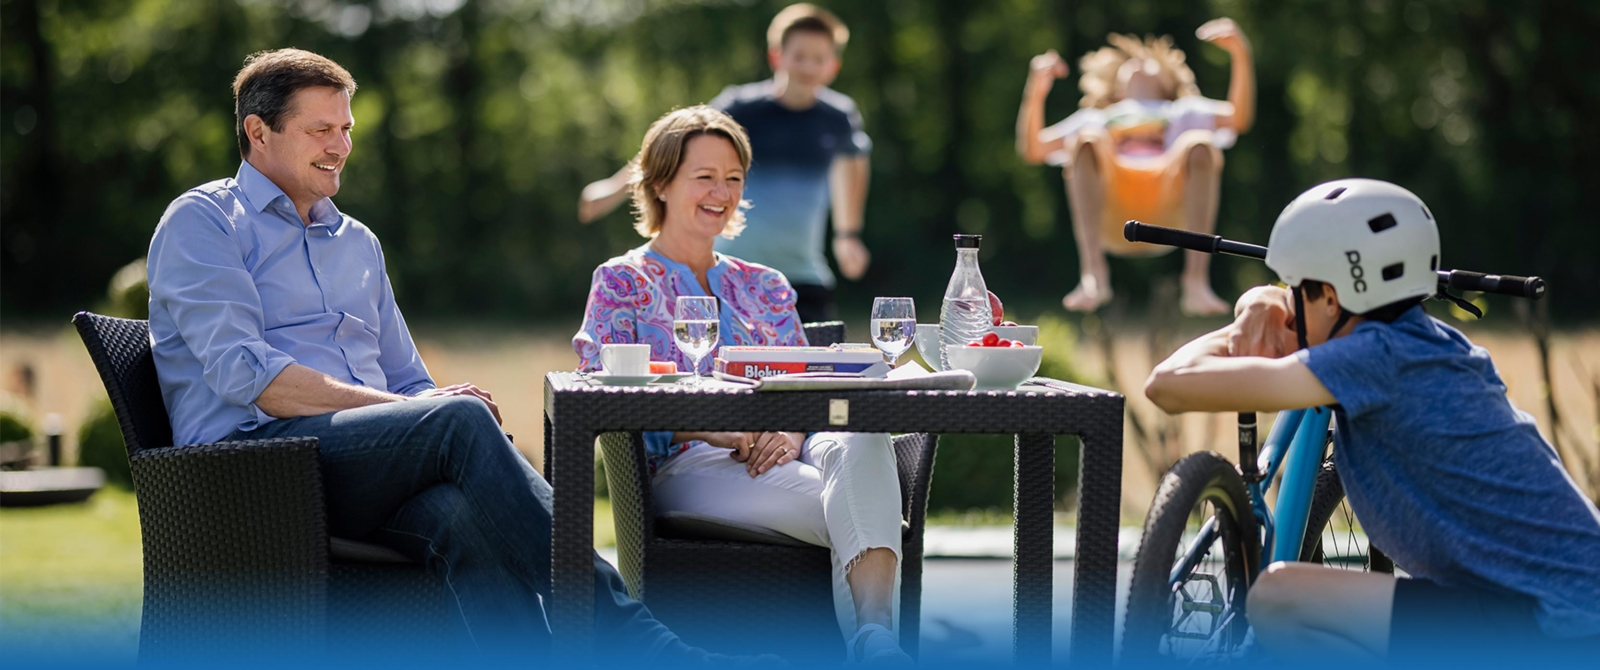 slider-oliver-grundmann-2021-bundestagswahlen-stade-rotenburg-bremervoerde (6)